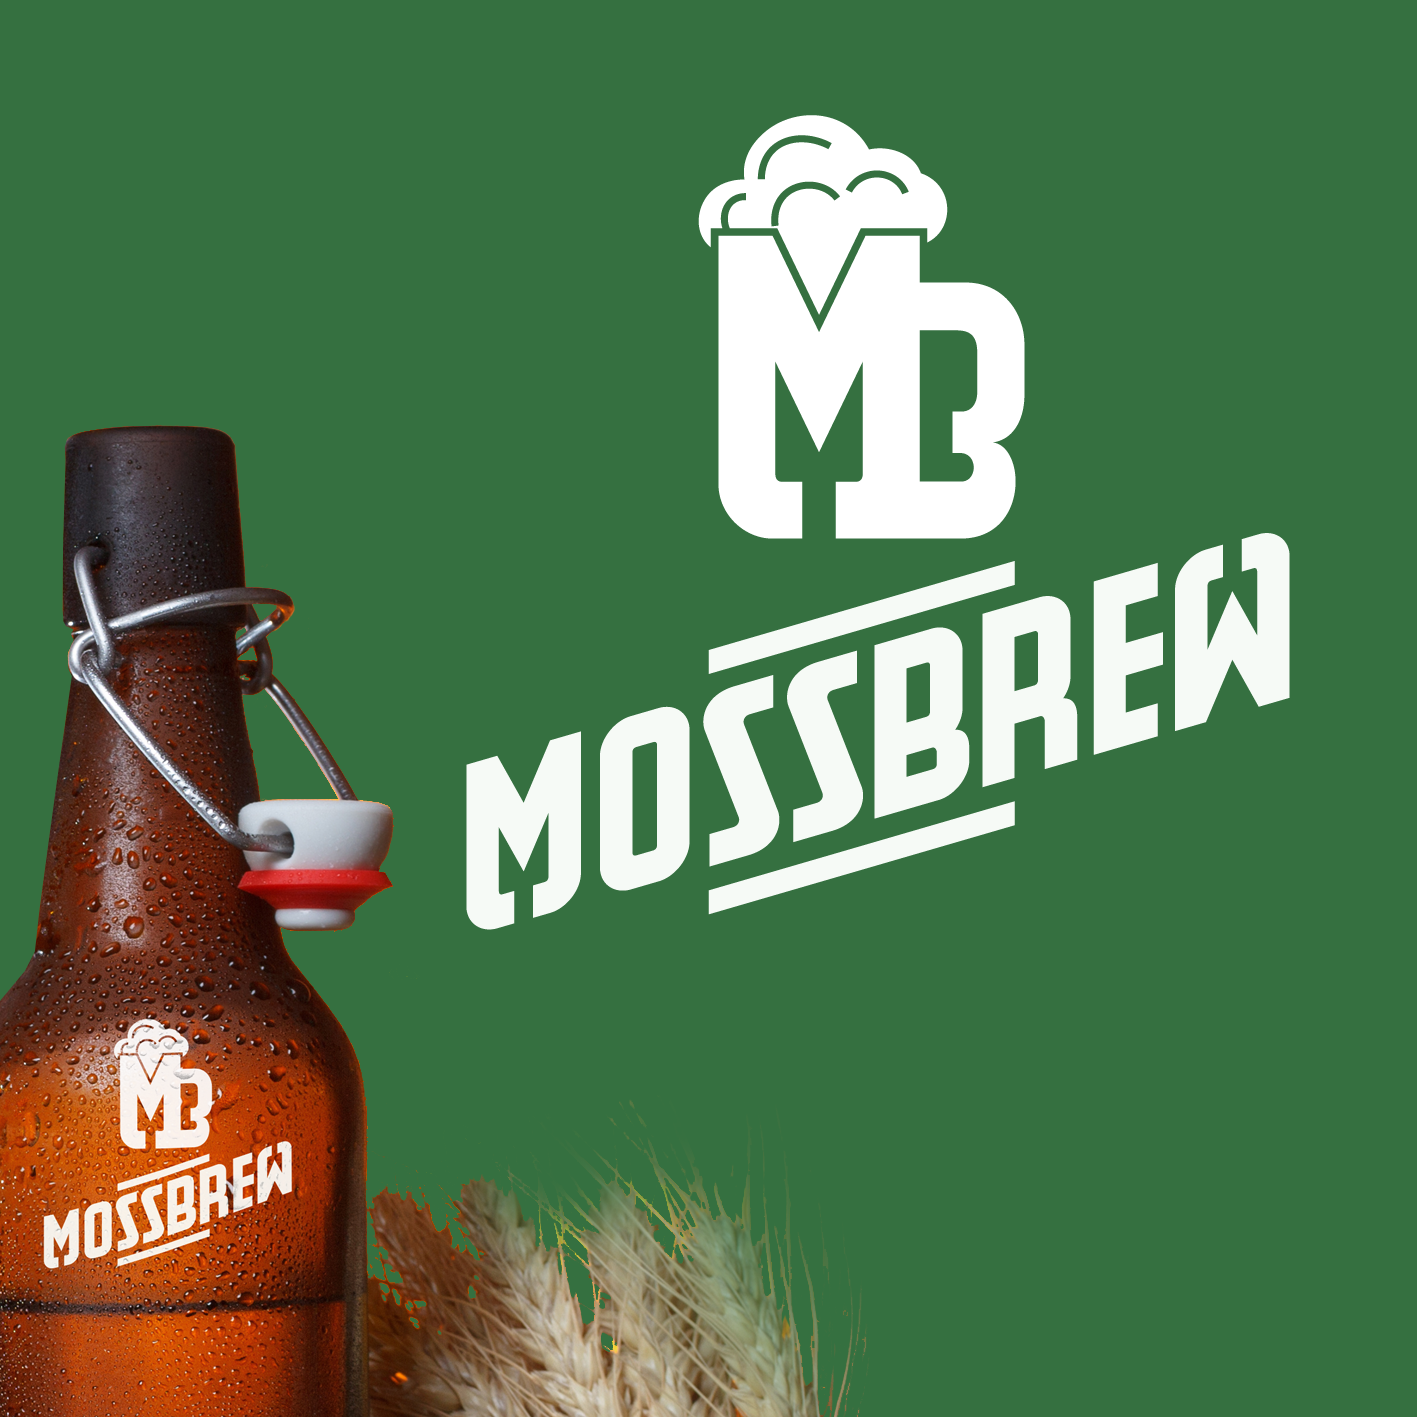 Логотип для пивоварни фото f_4125985f837dda2f.png